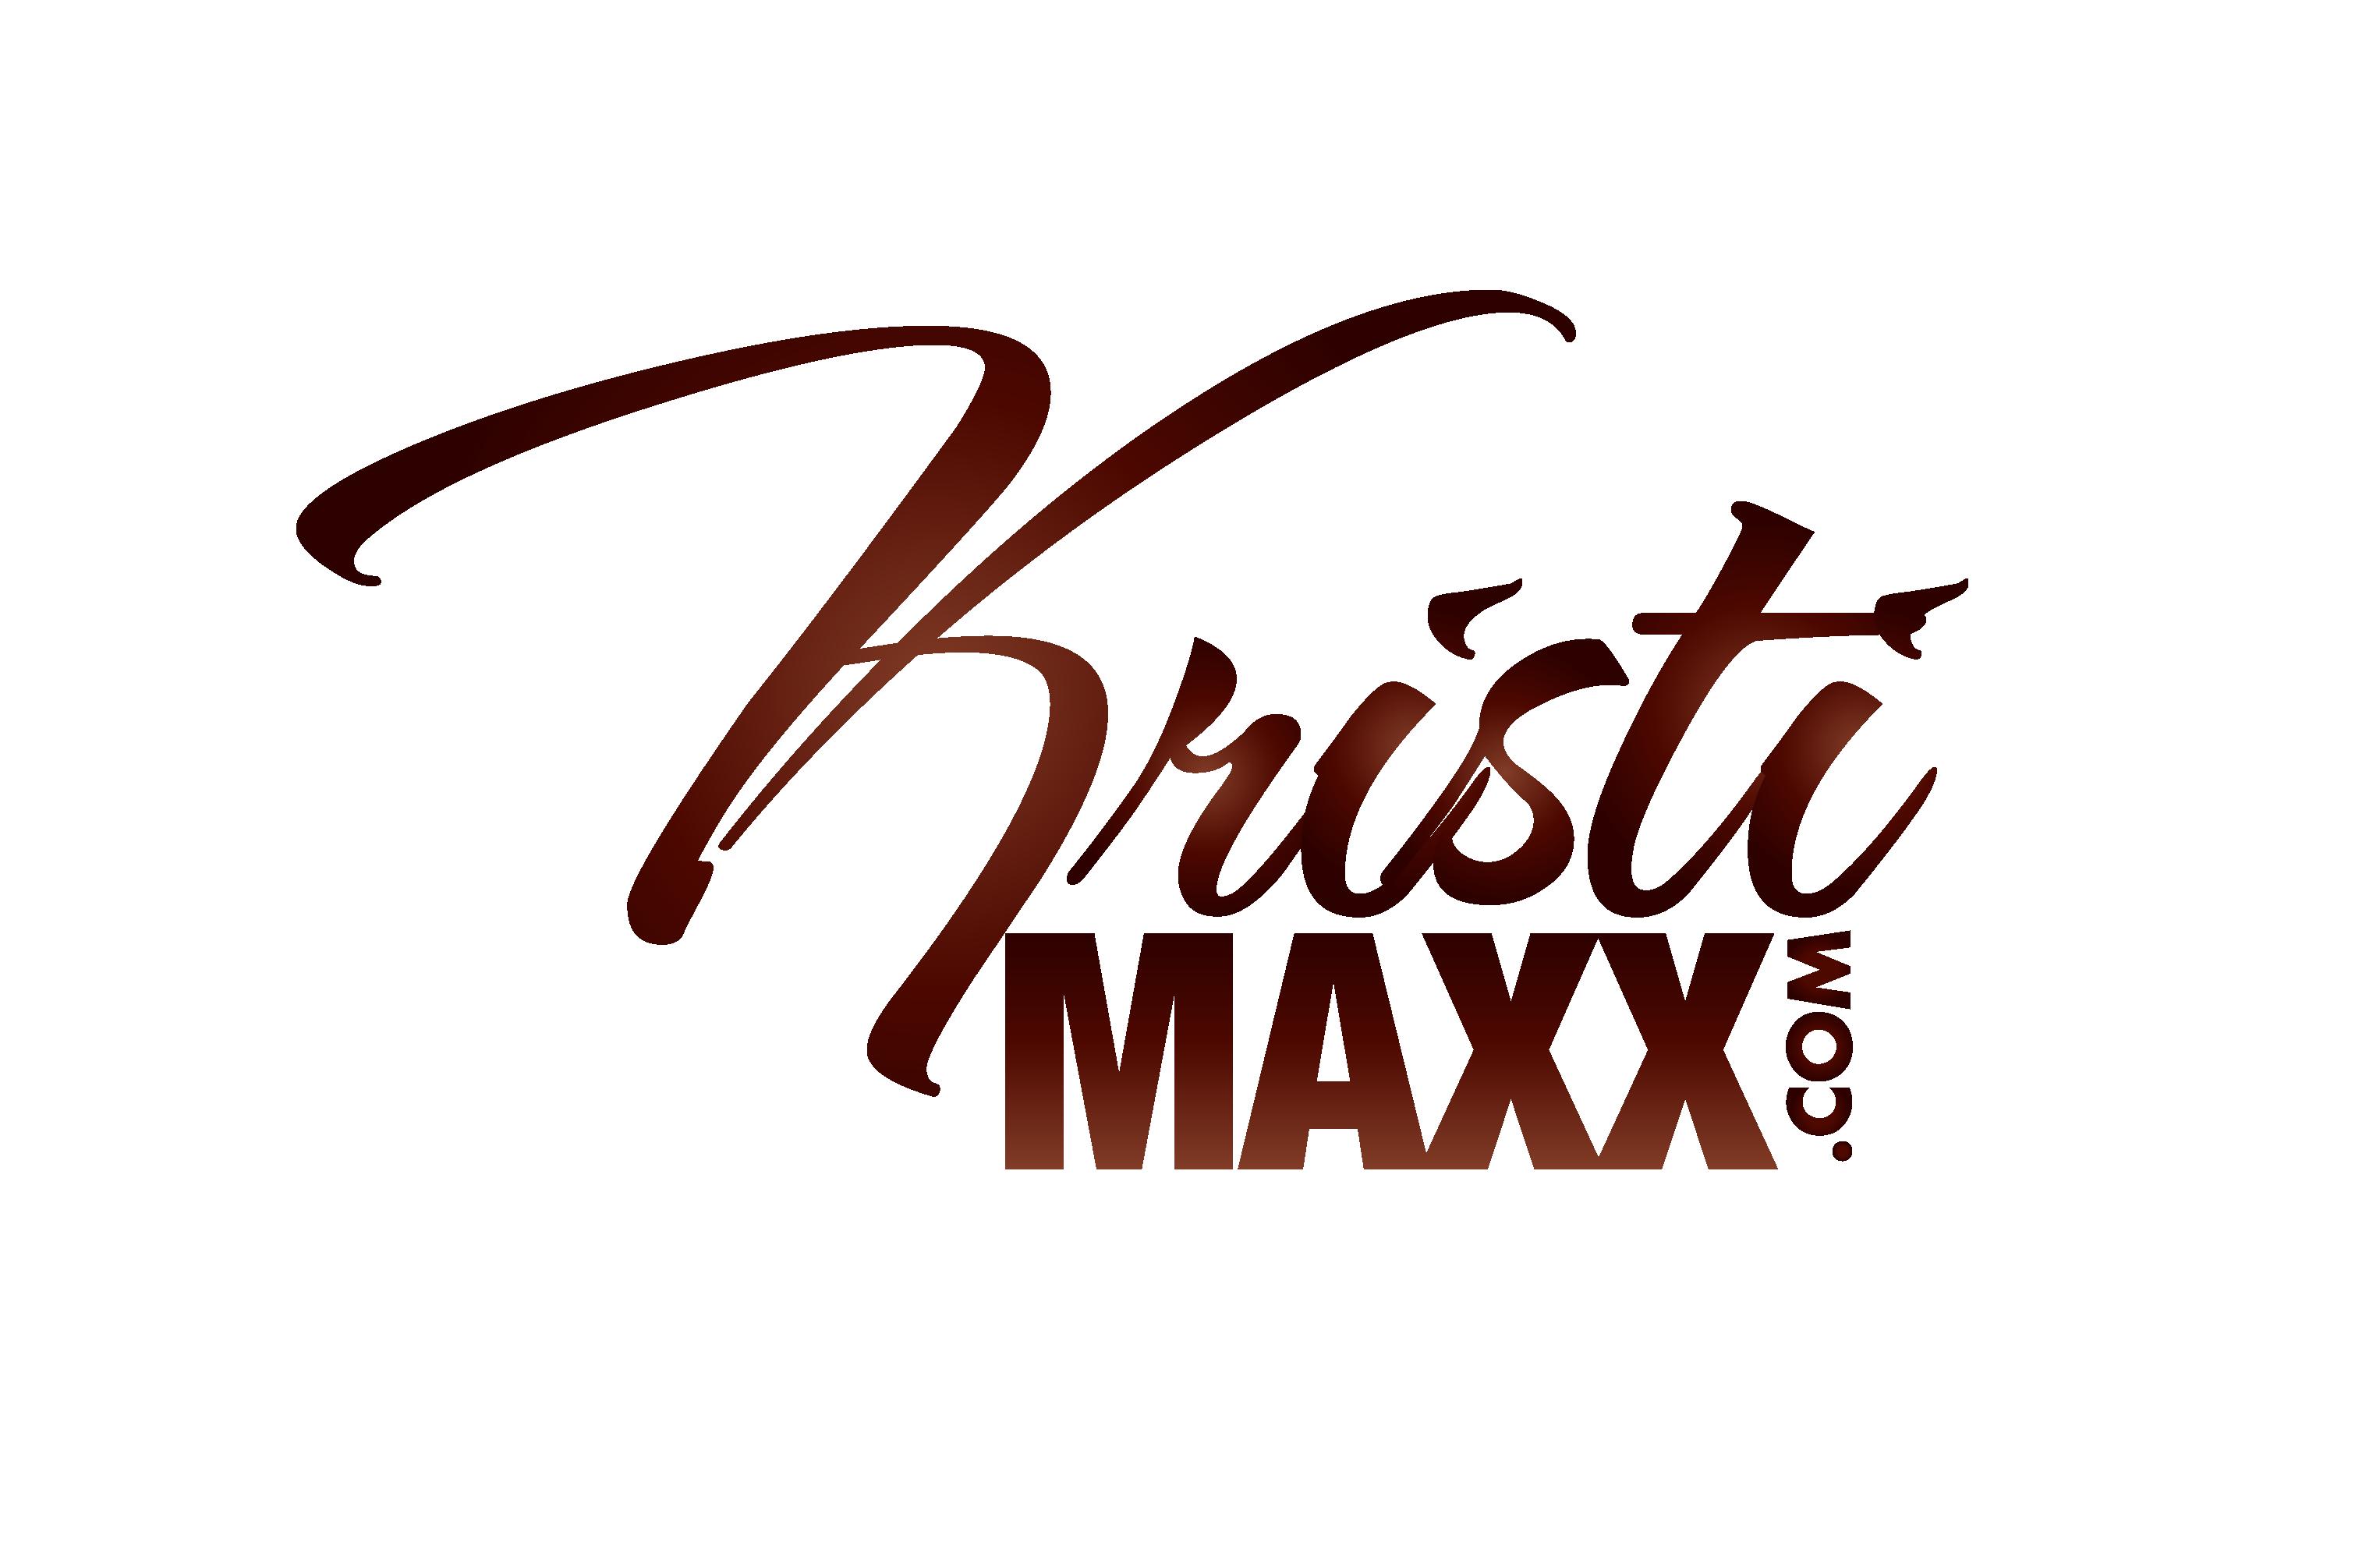 kristi maxx cam